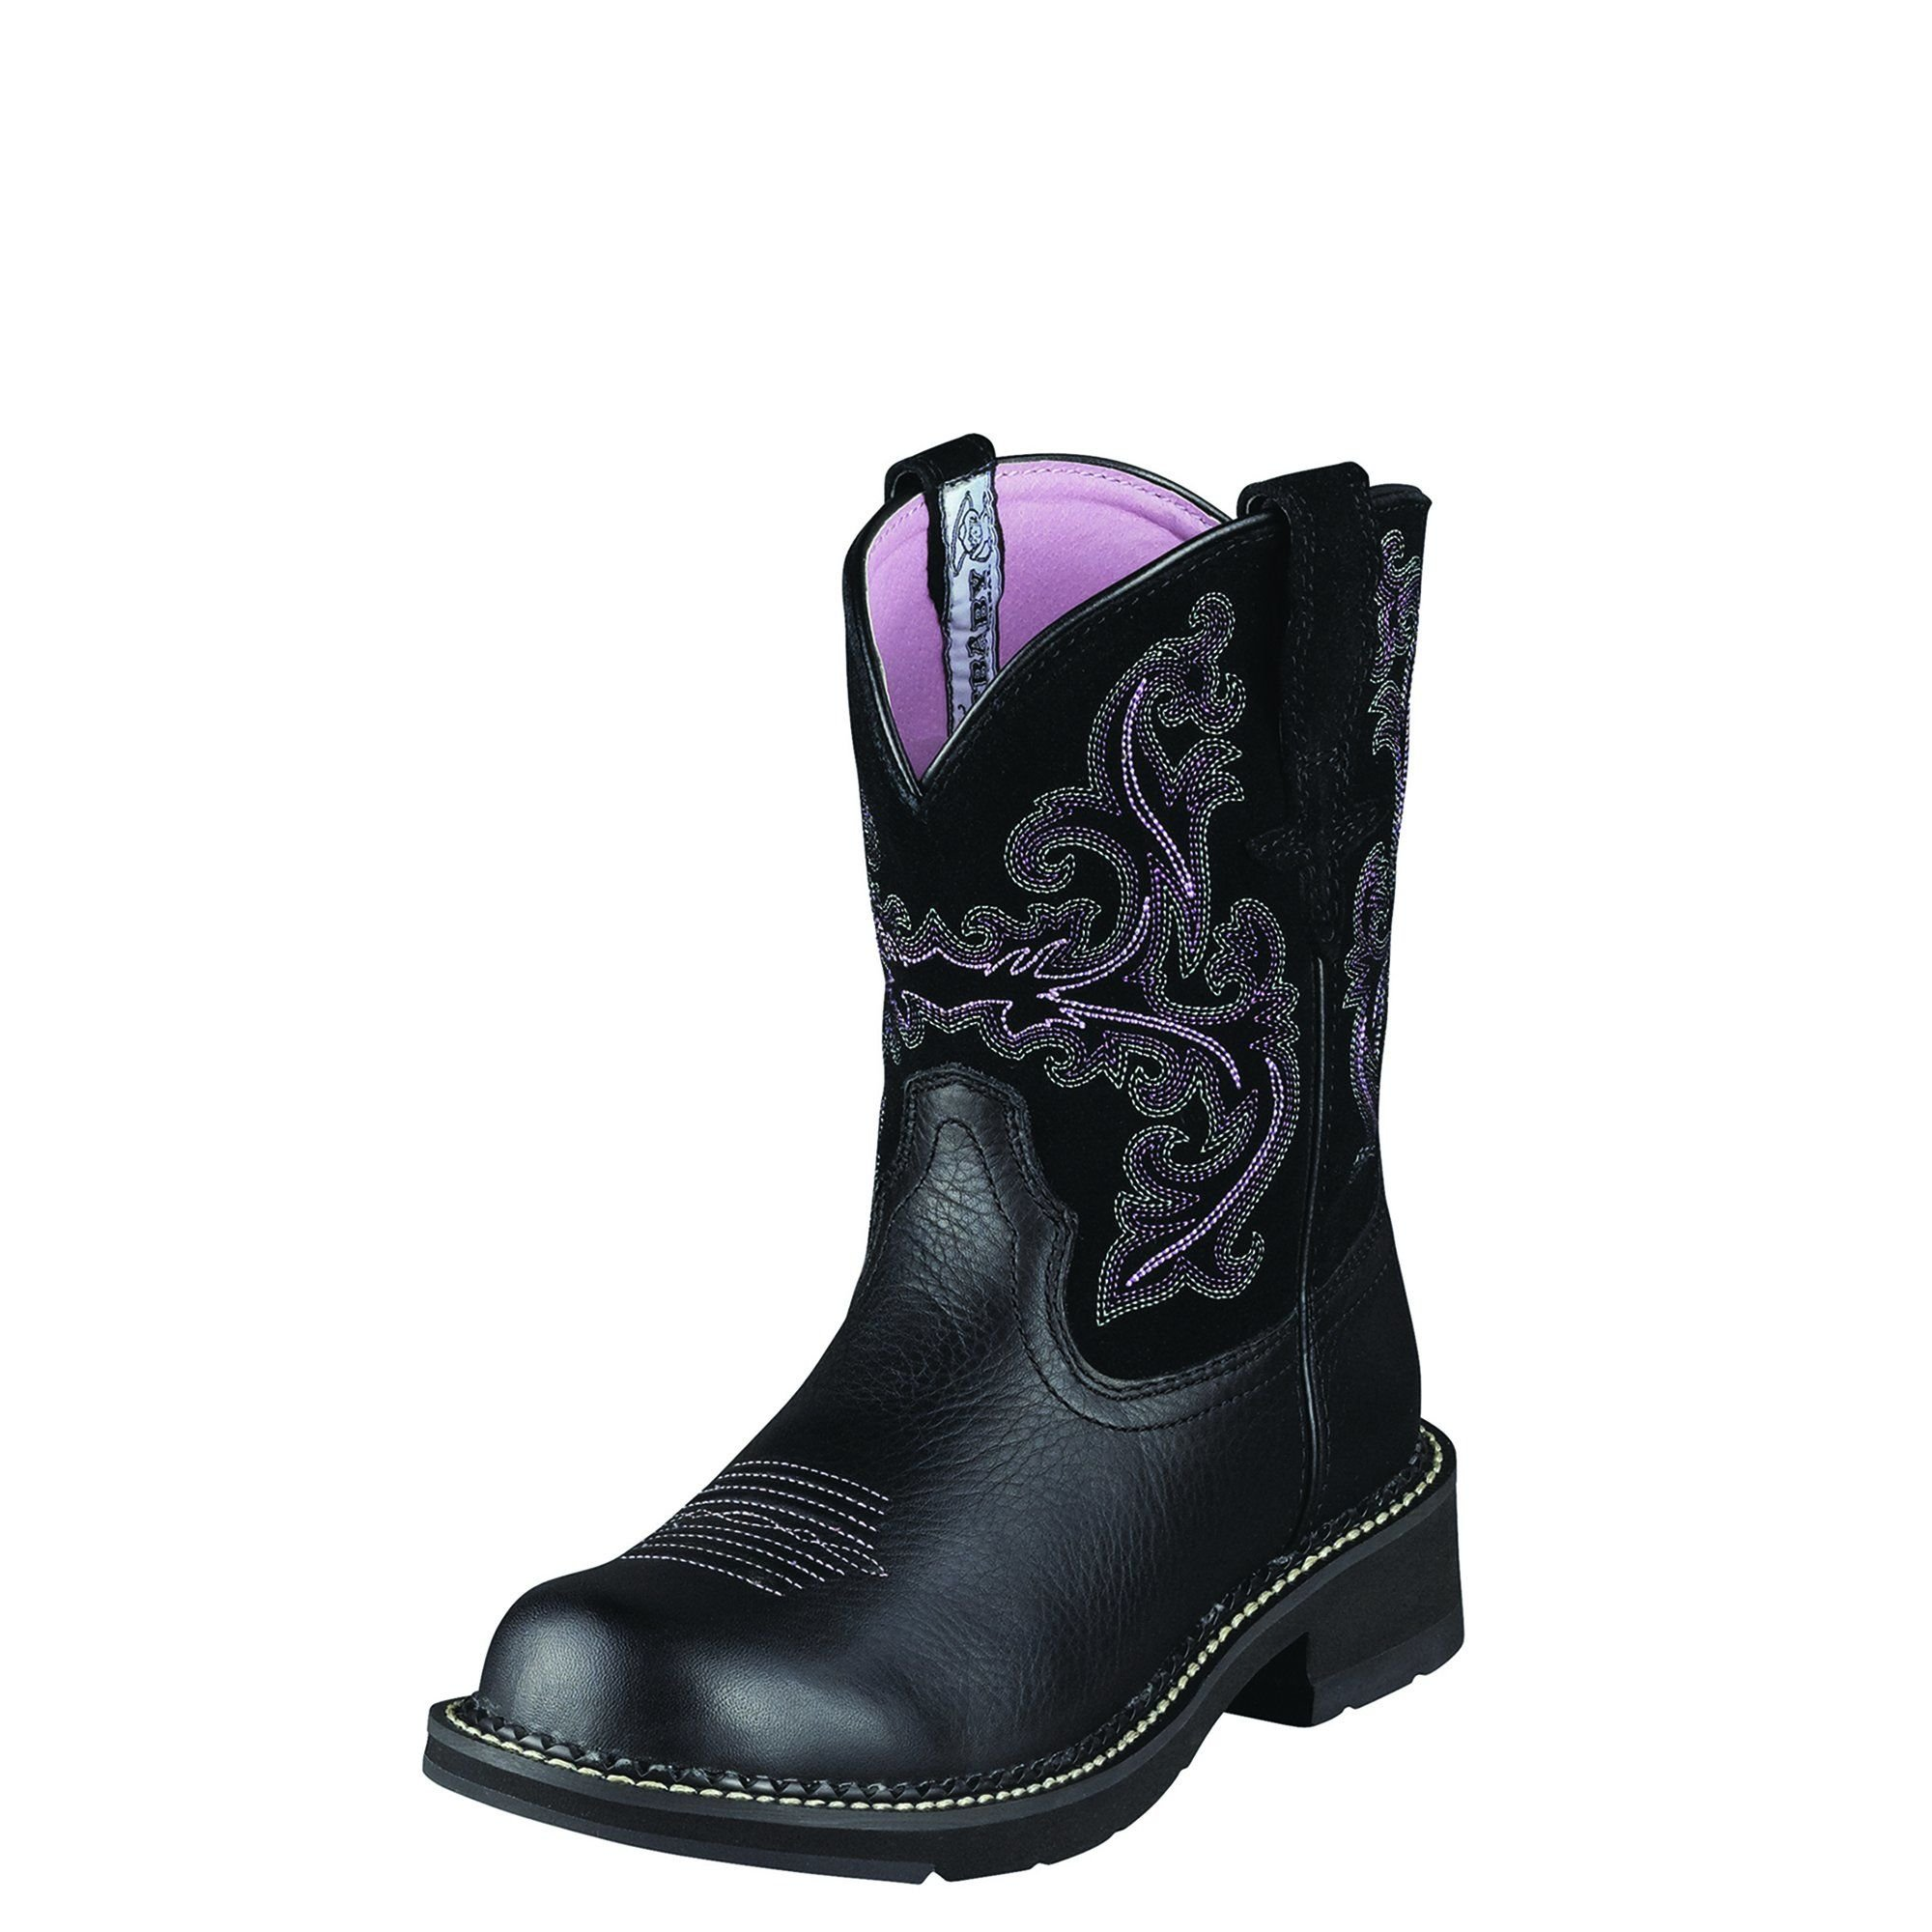 ARIAT WOMEN Fatbaby II Western Cowboy Boot, Black Deertan/Orchid, 9.5 M US